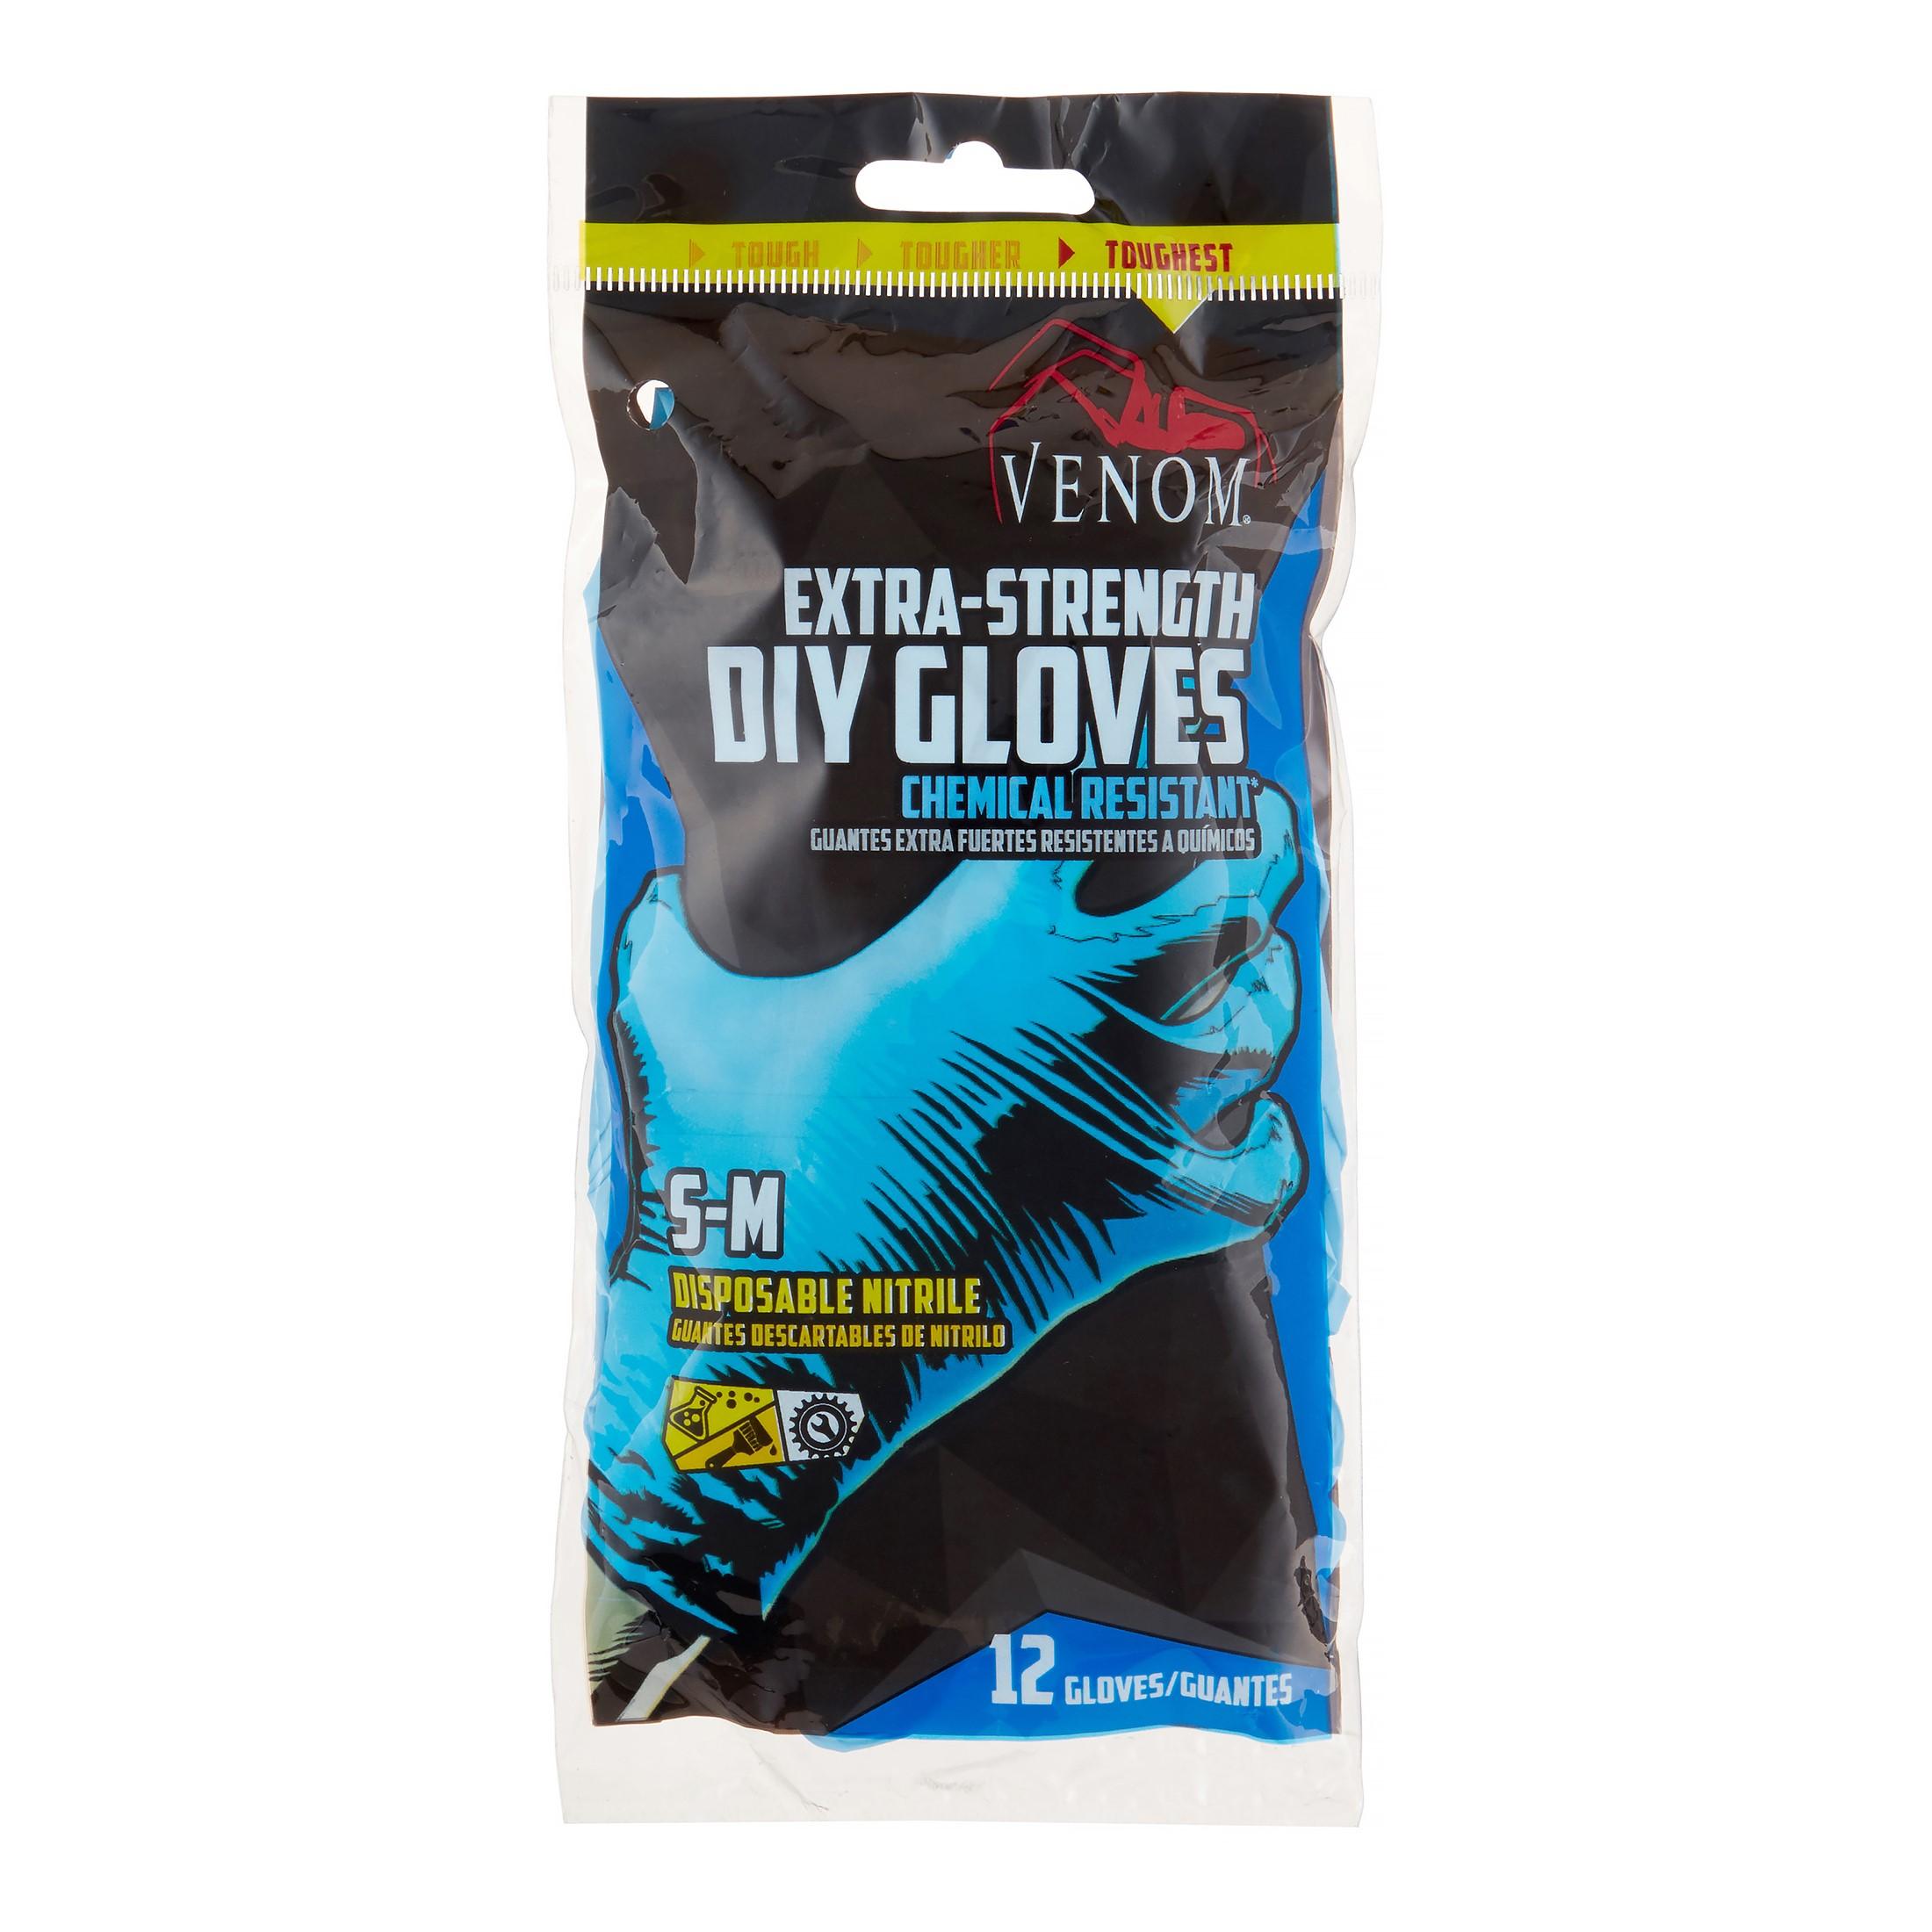 (4 Pack) Venom Extra Strength Nitrile Gloves, Small/Medium, 12 Ct